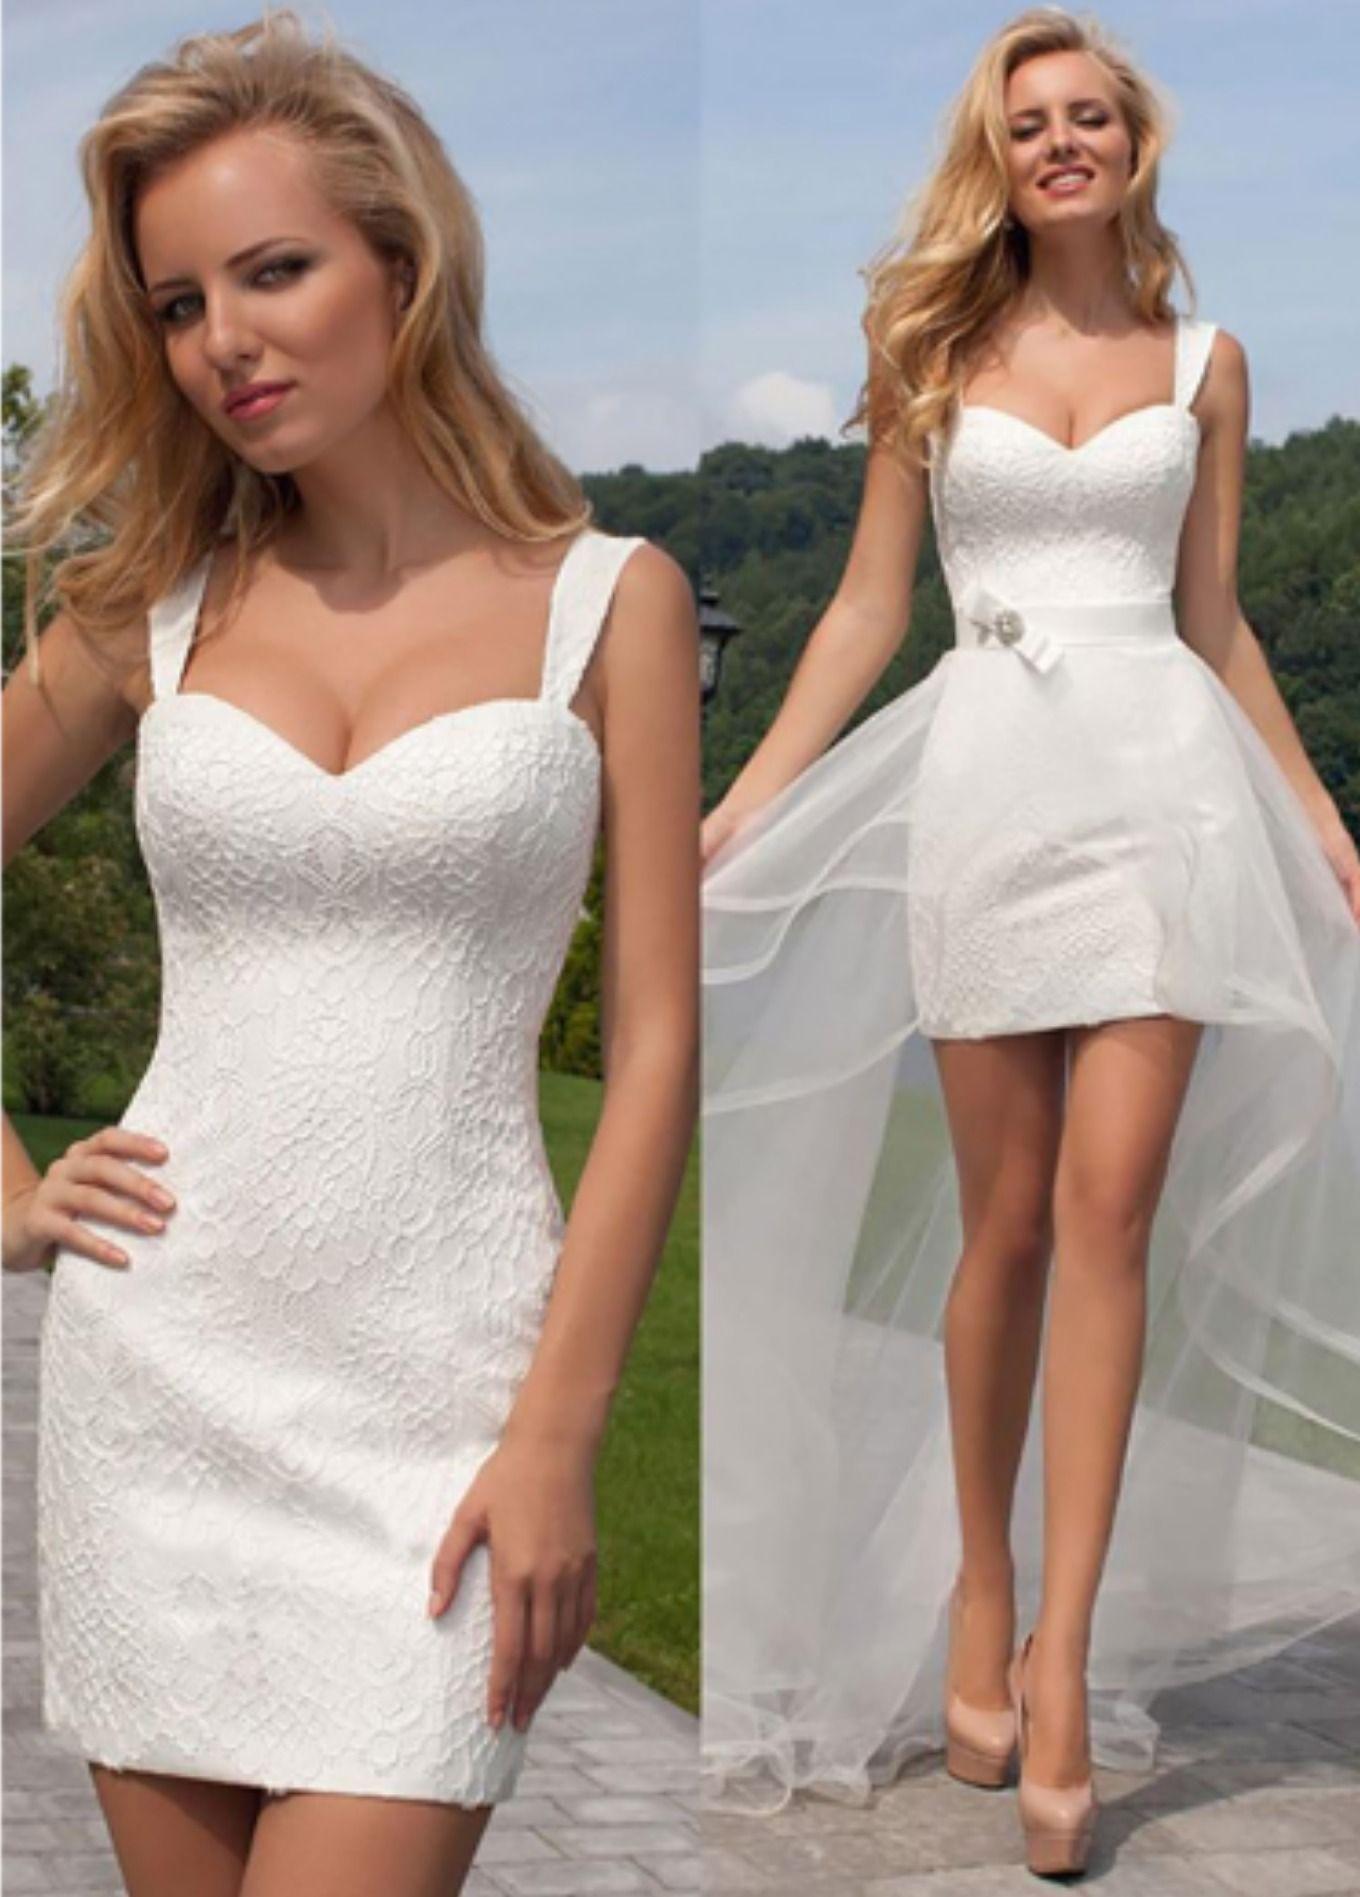 Simple Short Beach Wedding Dress With Detachable Skirt Simple Wedding Dress Short Simple Wedding Dress Beach Short Wedding Dress Beach [ 1897 x 1360 Pixel ]